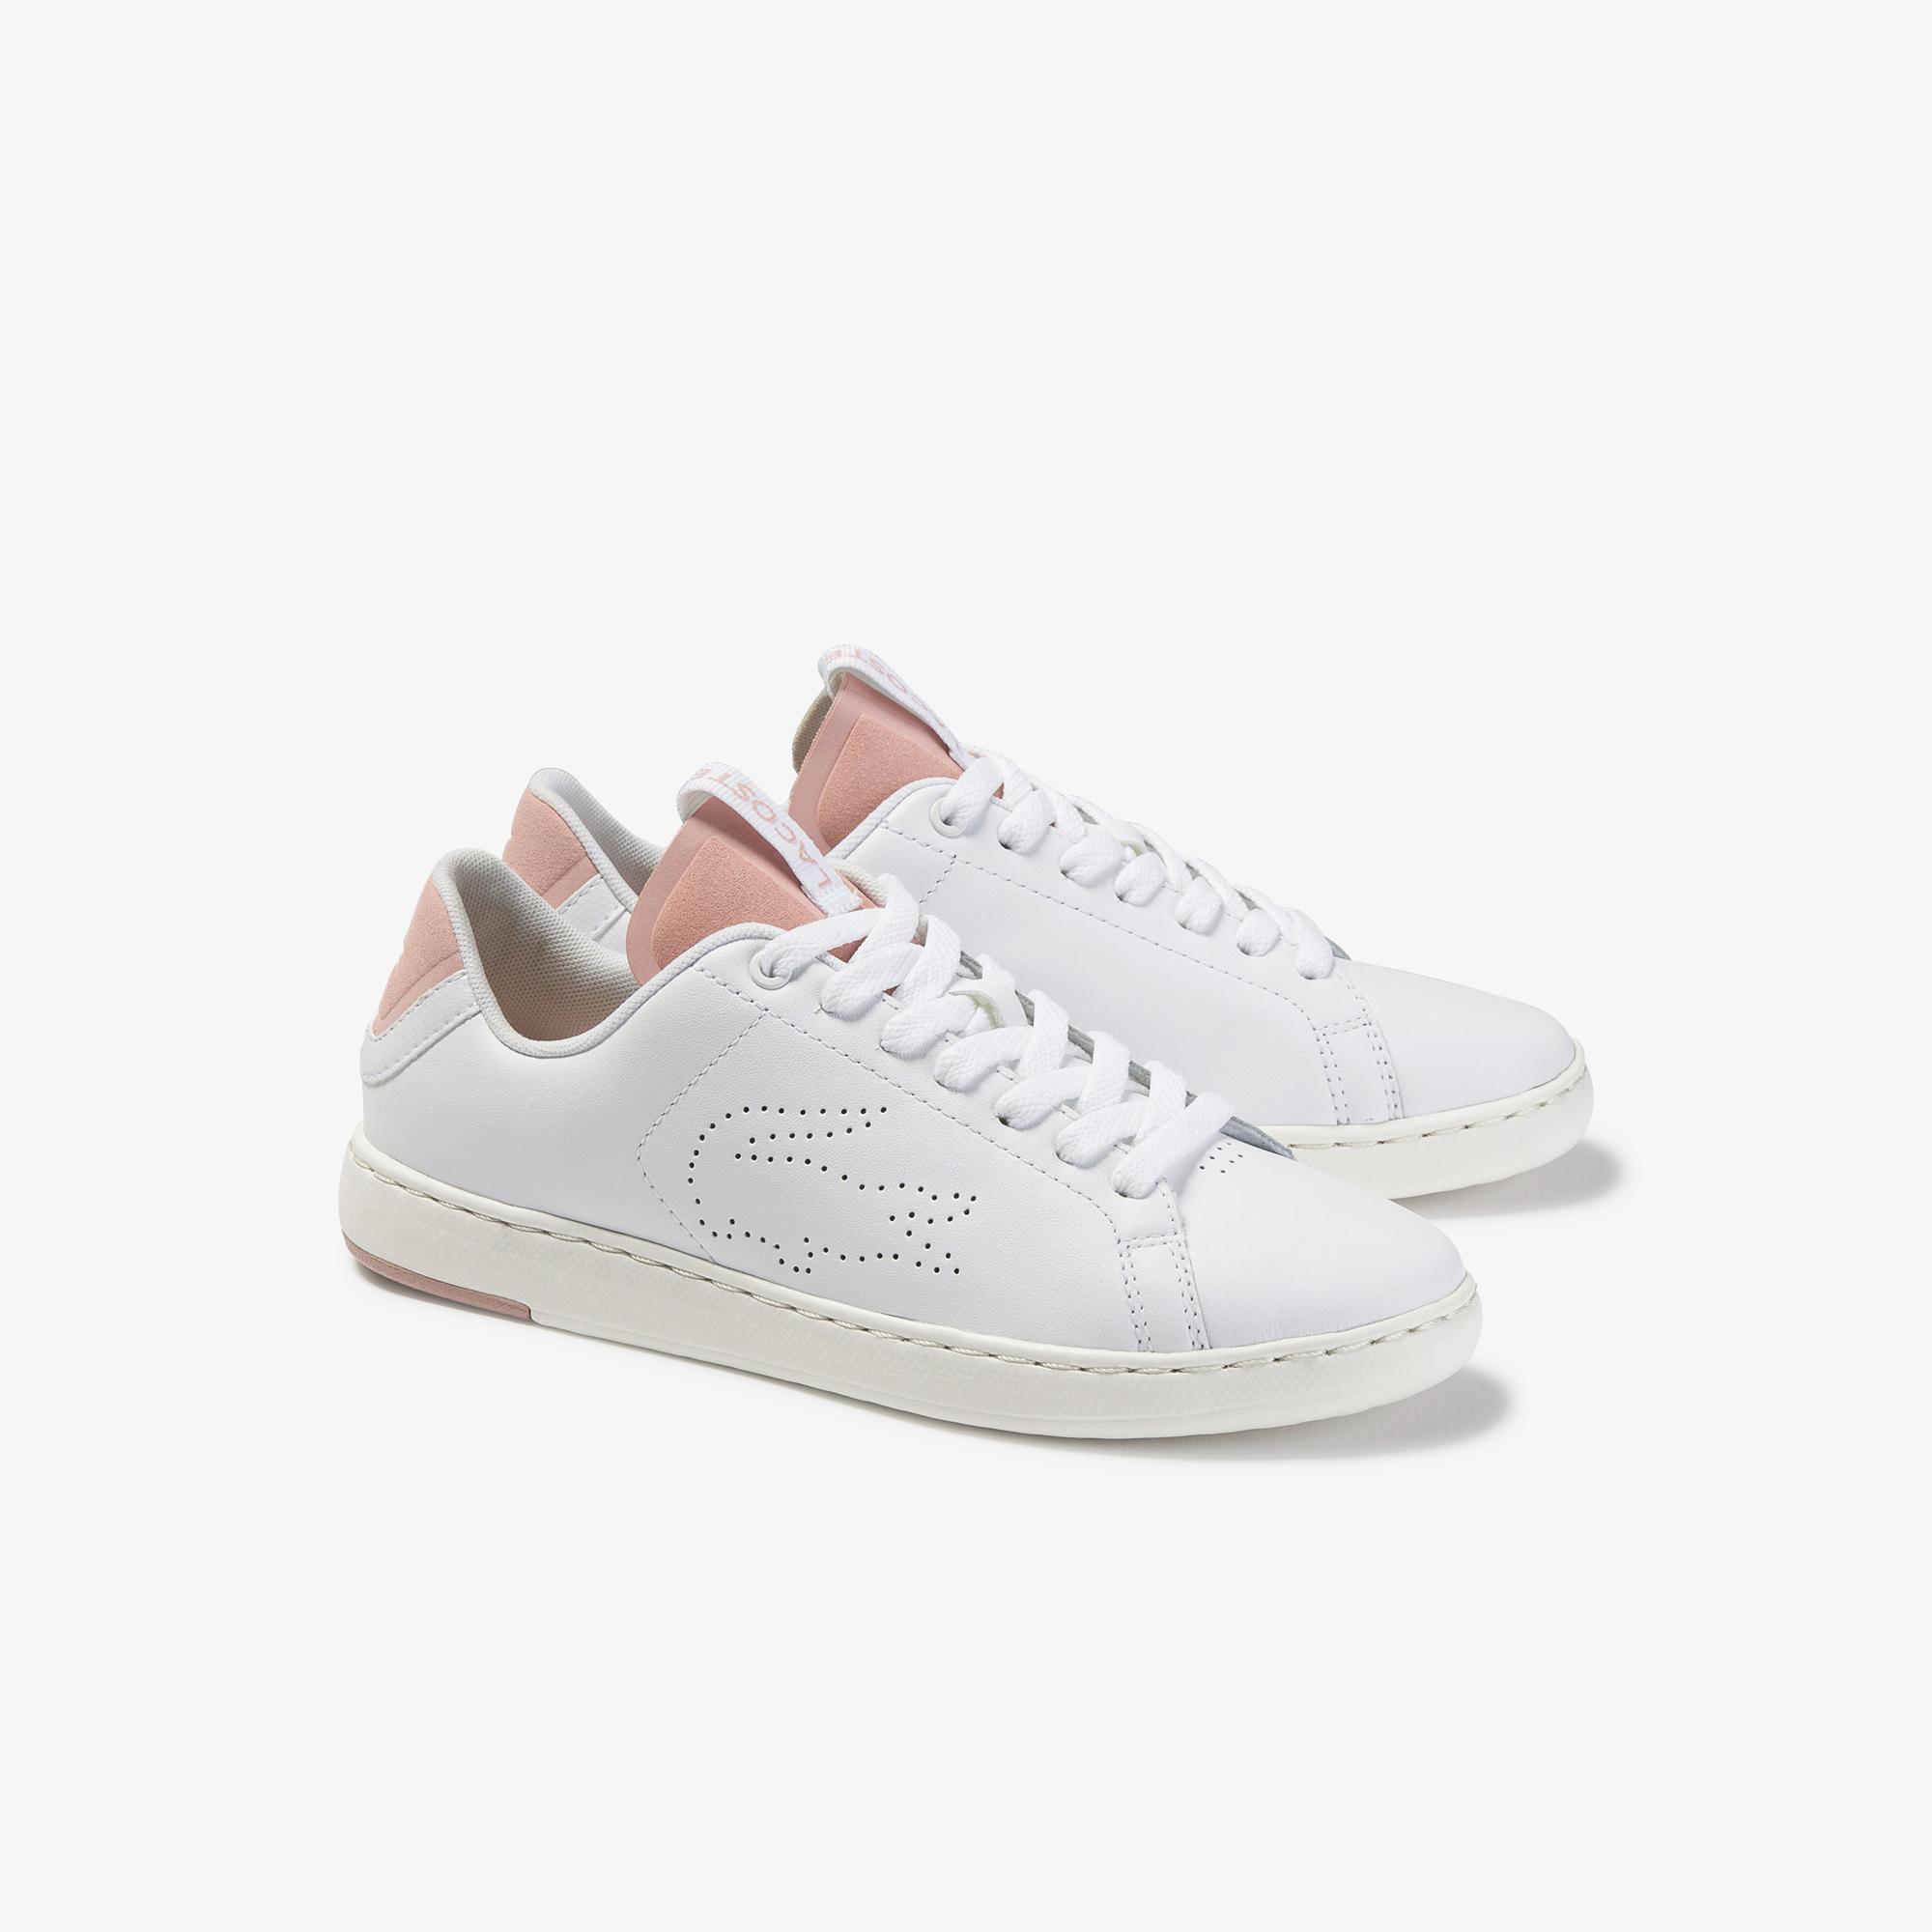 Lacoste Women's Carnaby Evo Light-Wt 1201 Leather Sneakers